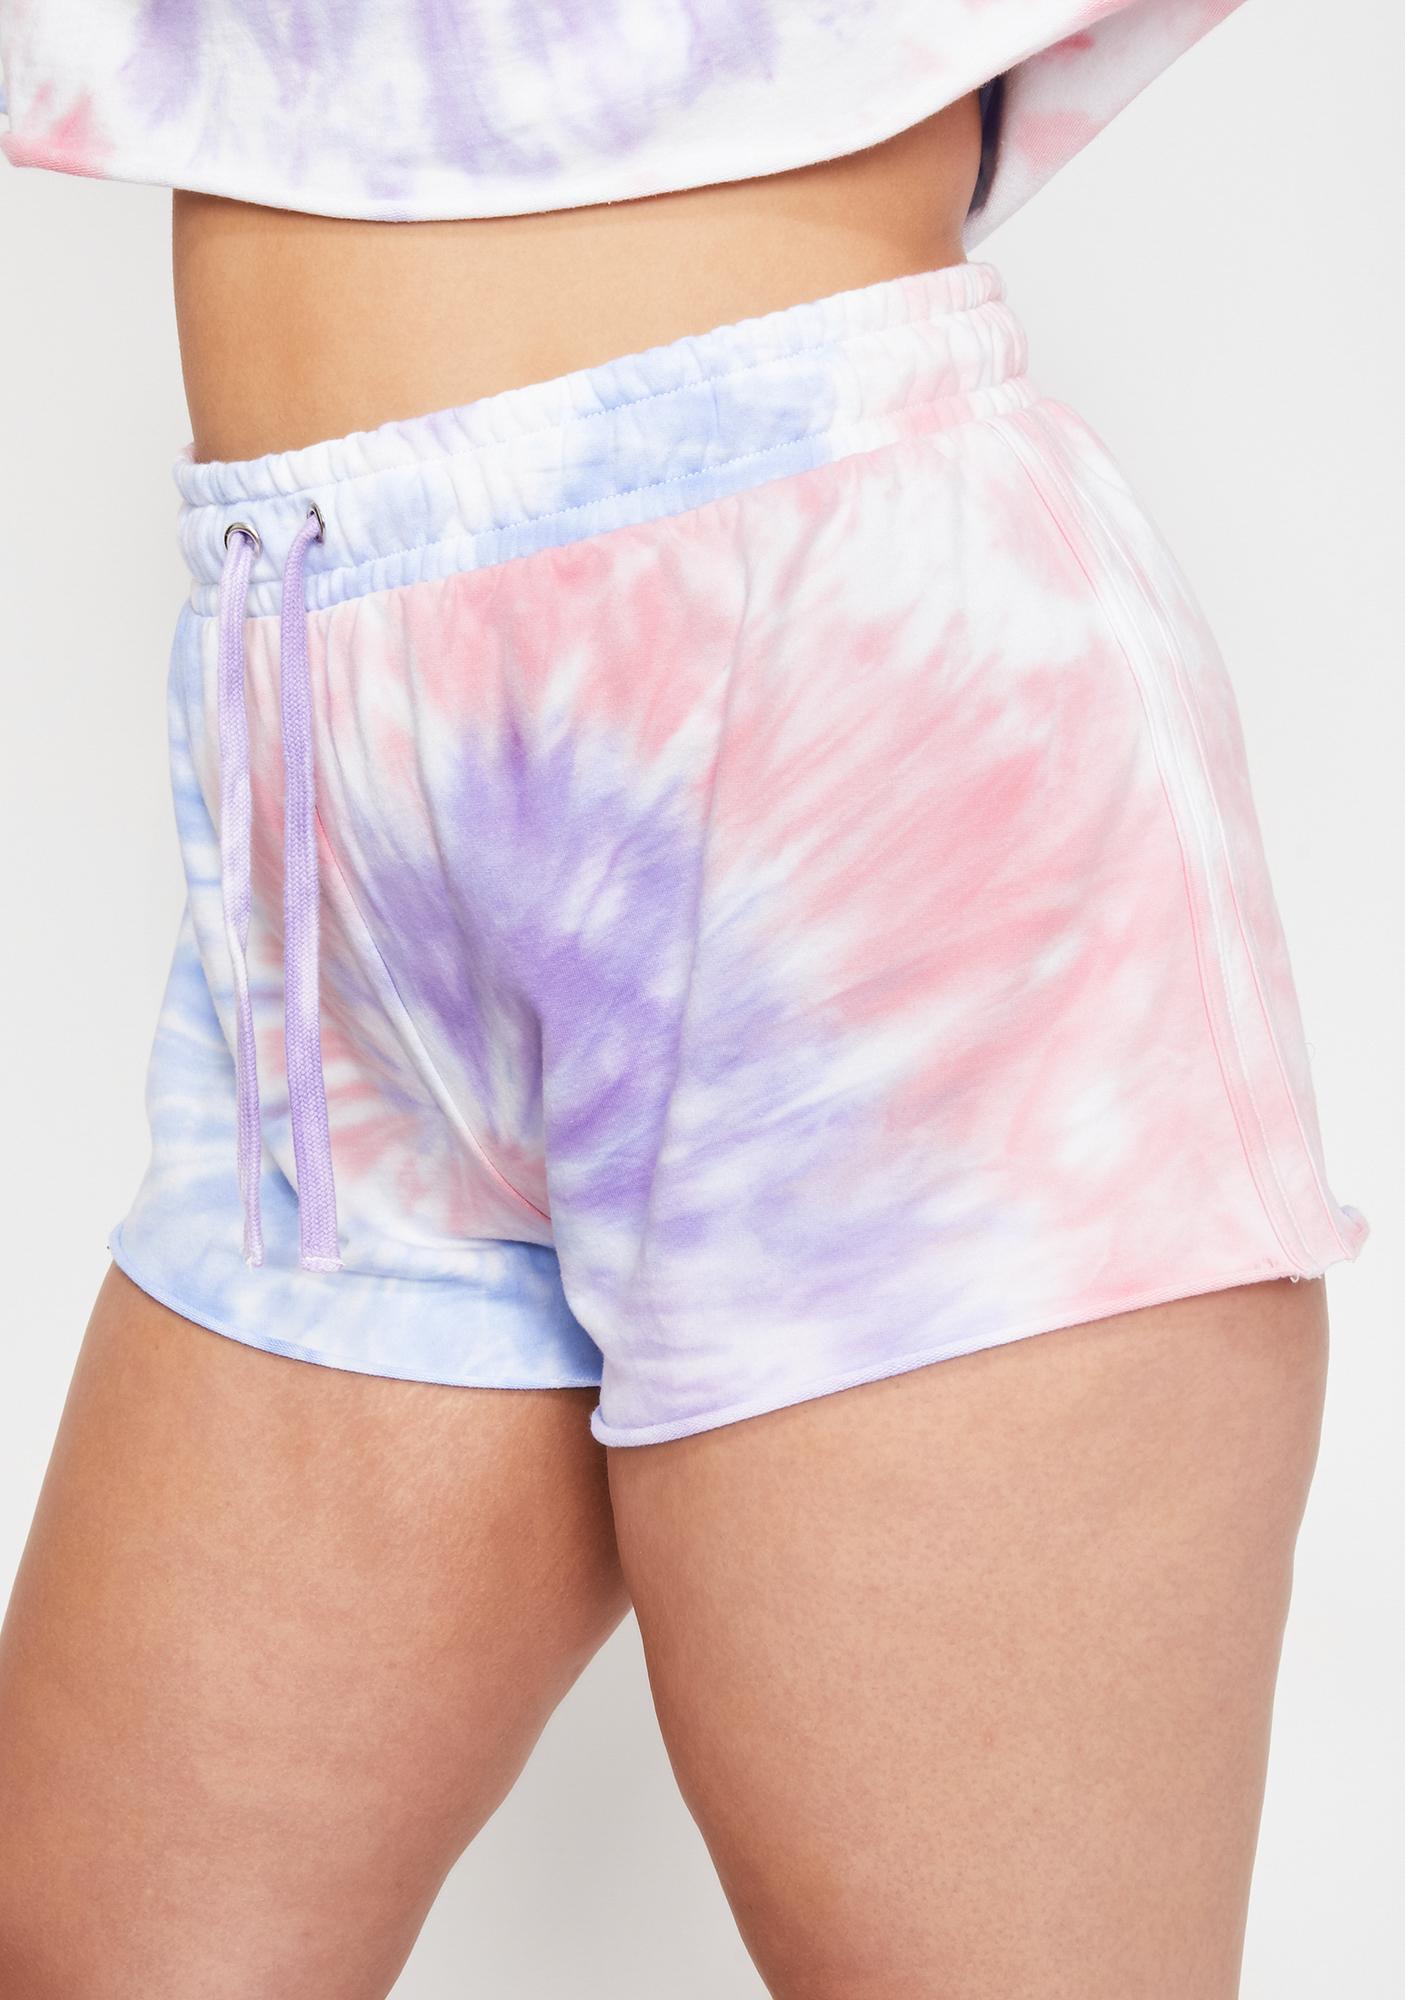 HOROSCOPEZ Dear Moody Mystic Tie Dye Shorts